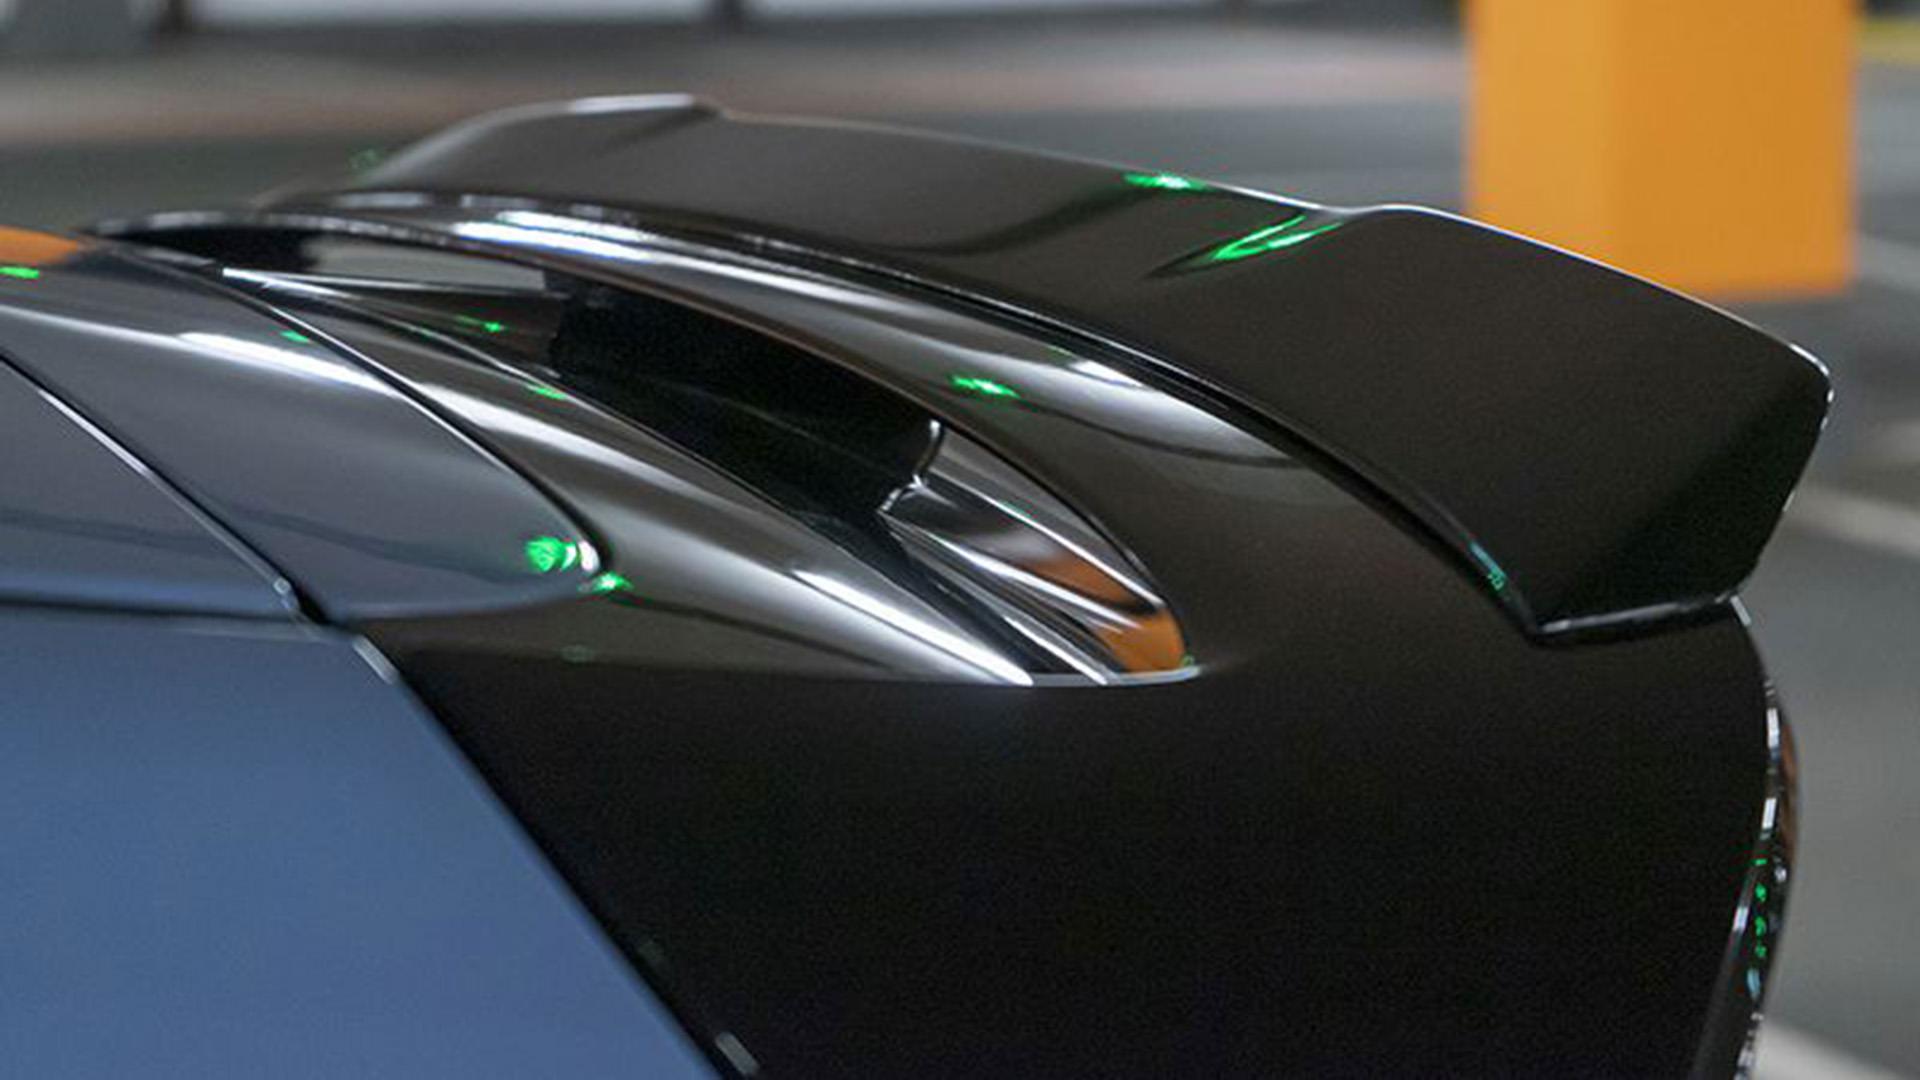 hyundai i30 n tuning prior design wide body kit 13 پرایر دیزاین, هیوندای i30N